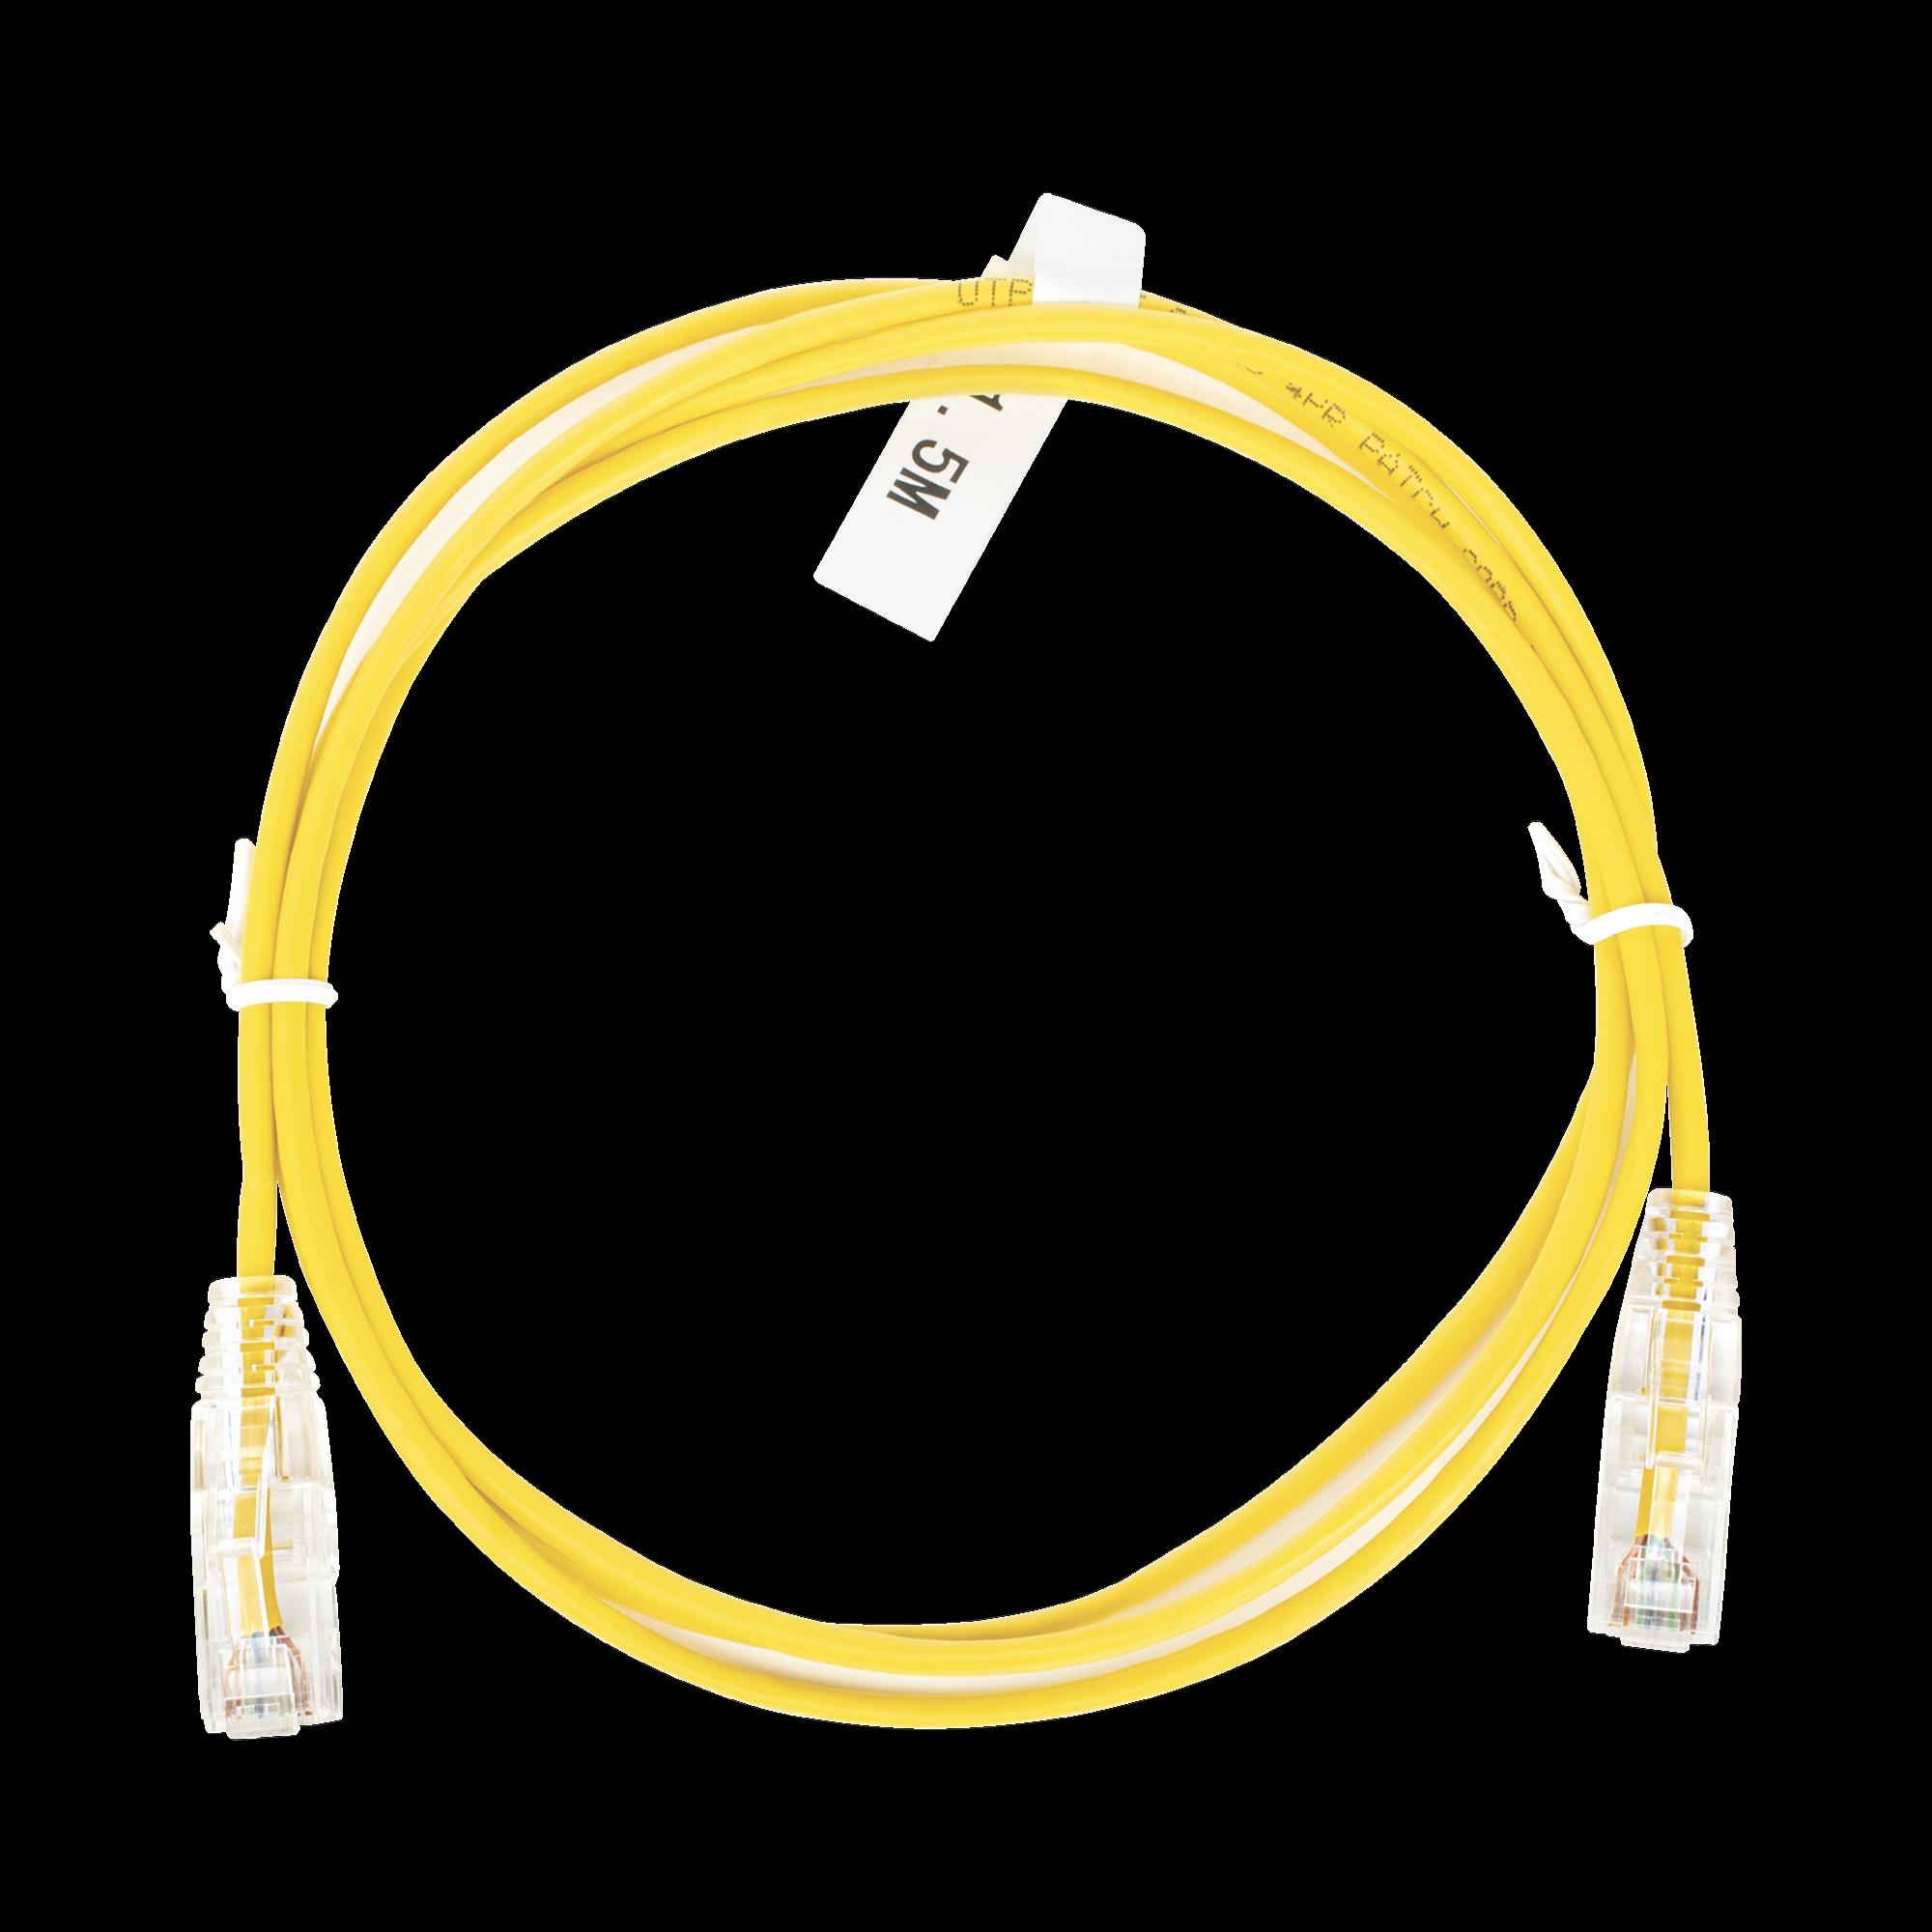 Cable de Parcheo Slim UTP Cat6 - 1.5 m Amarillo Diámetro Reducido (28 AWG)